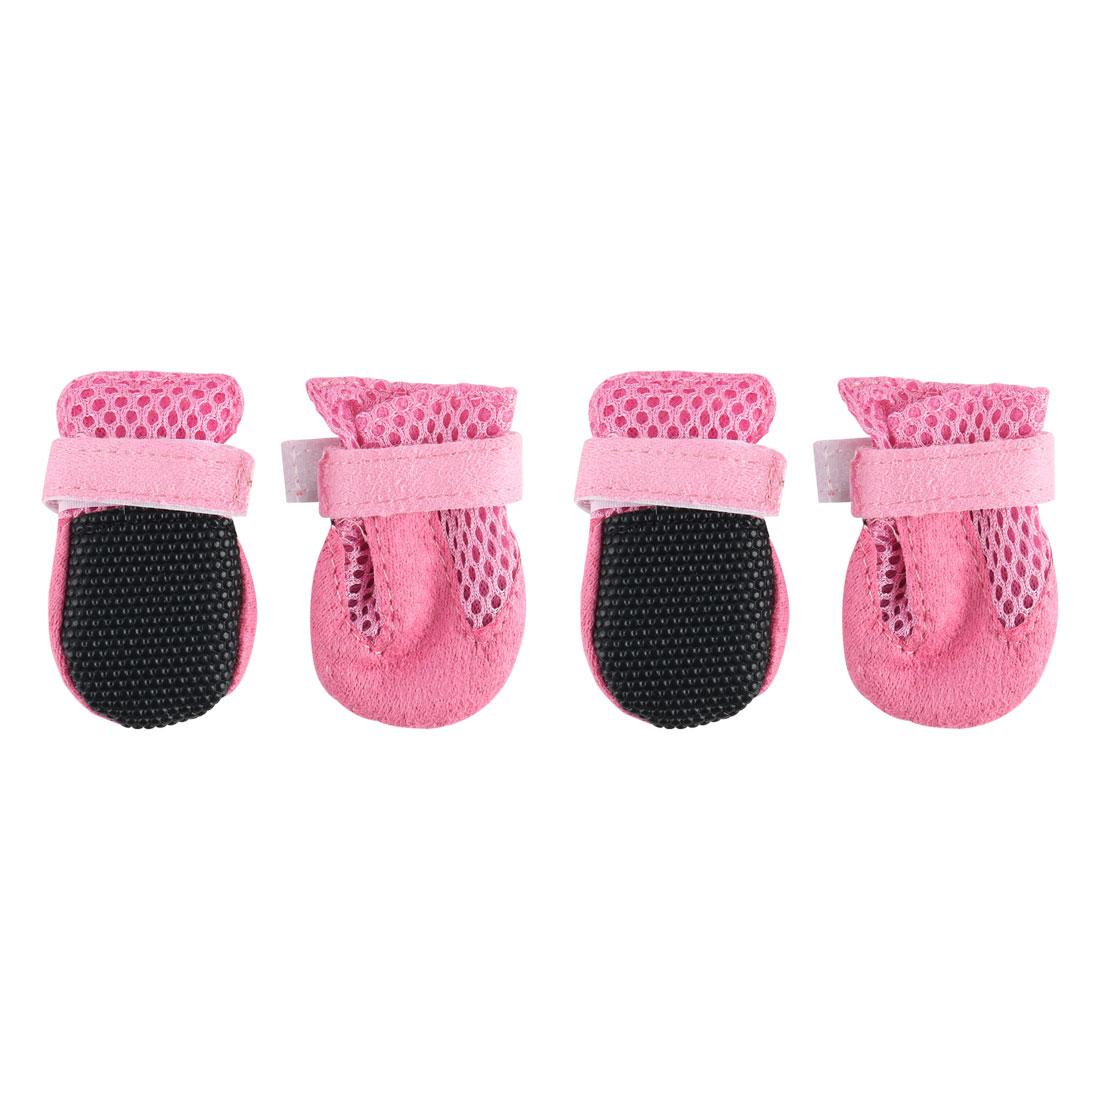 Dog Shoes Pet Boots Wear Resistant Breathable Hiking Paw Protectors Pink 4pcs, L